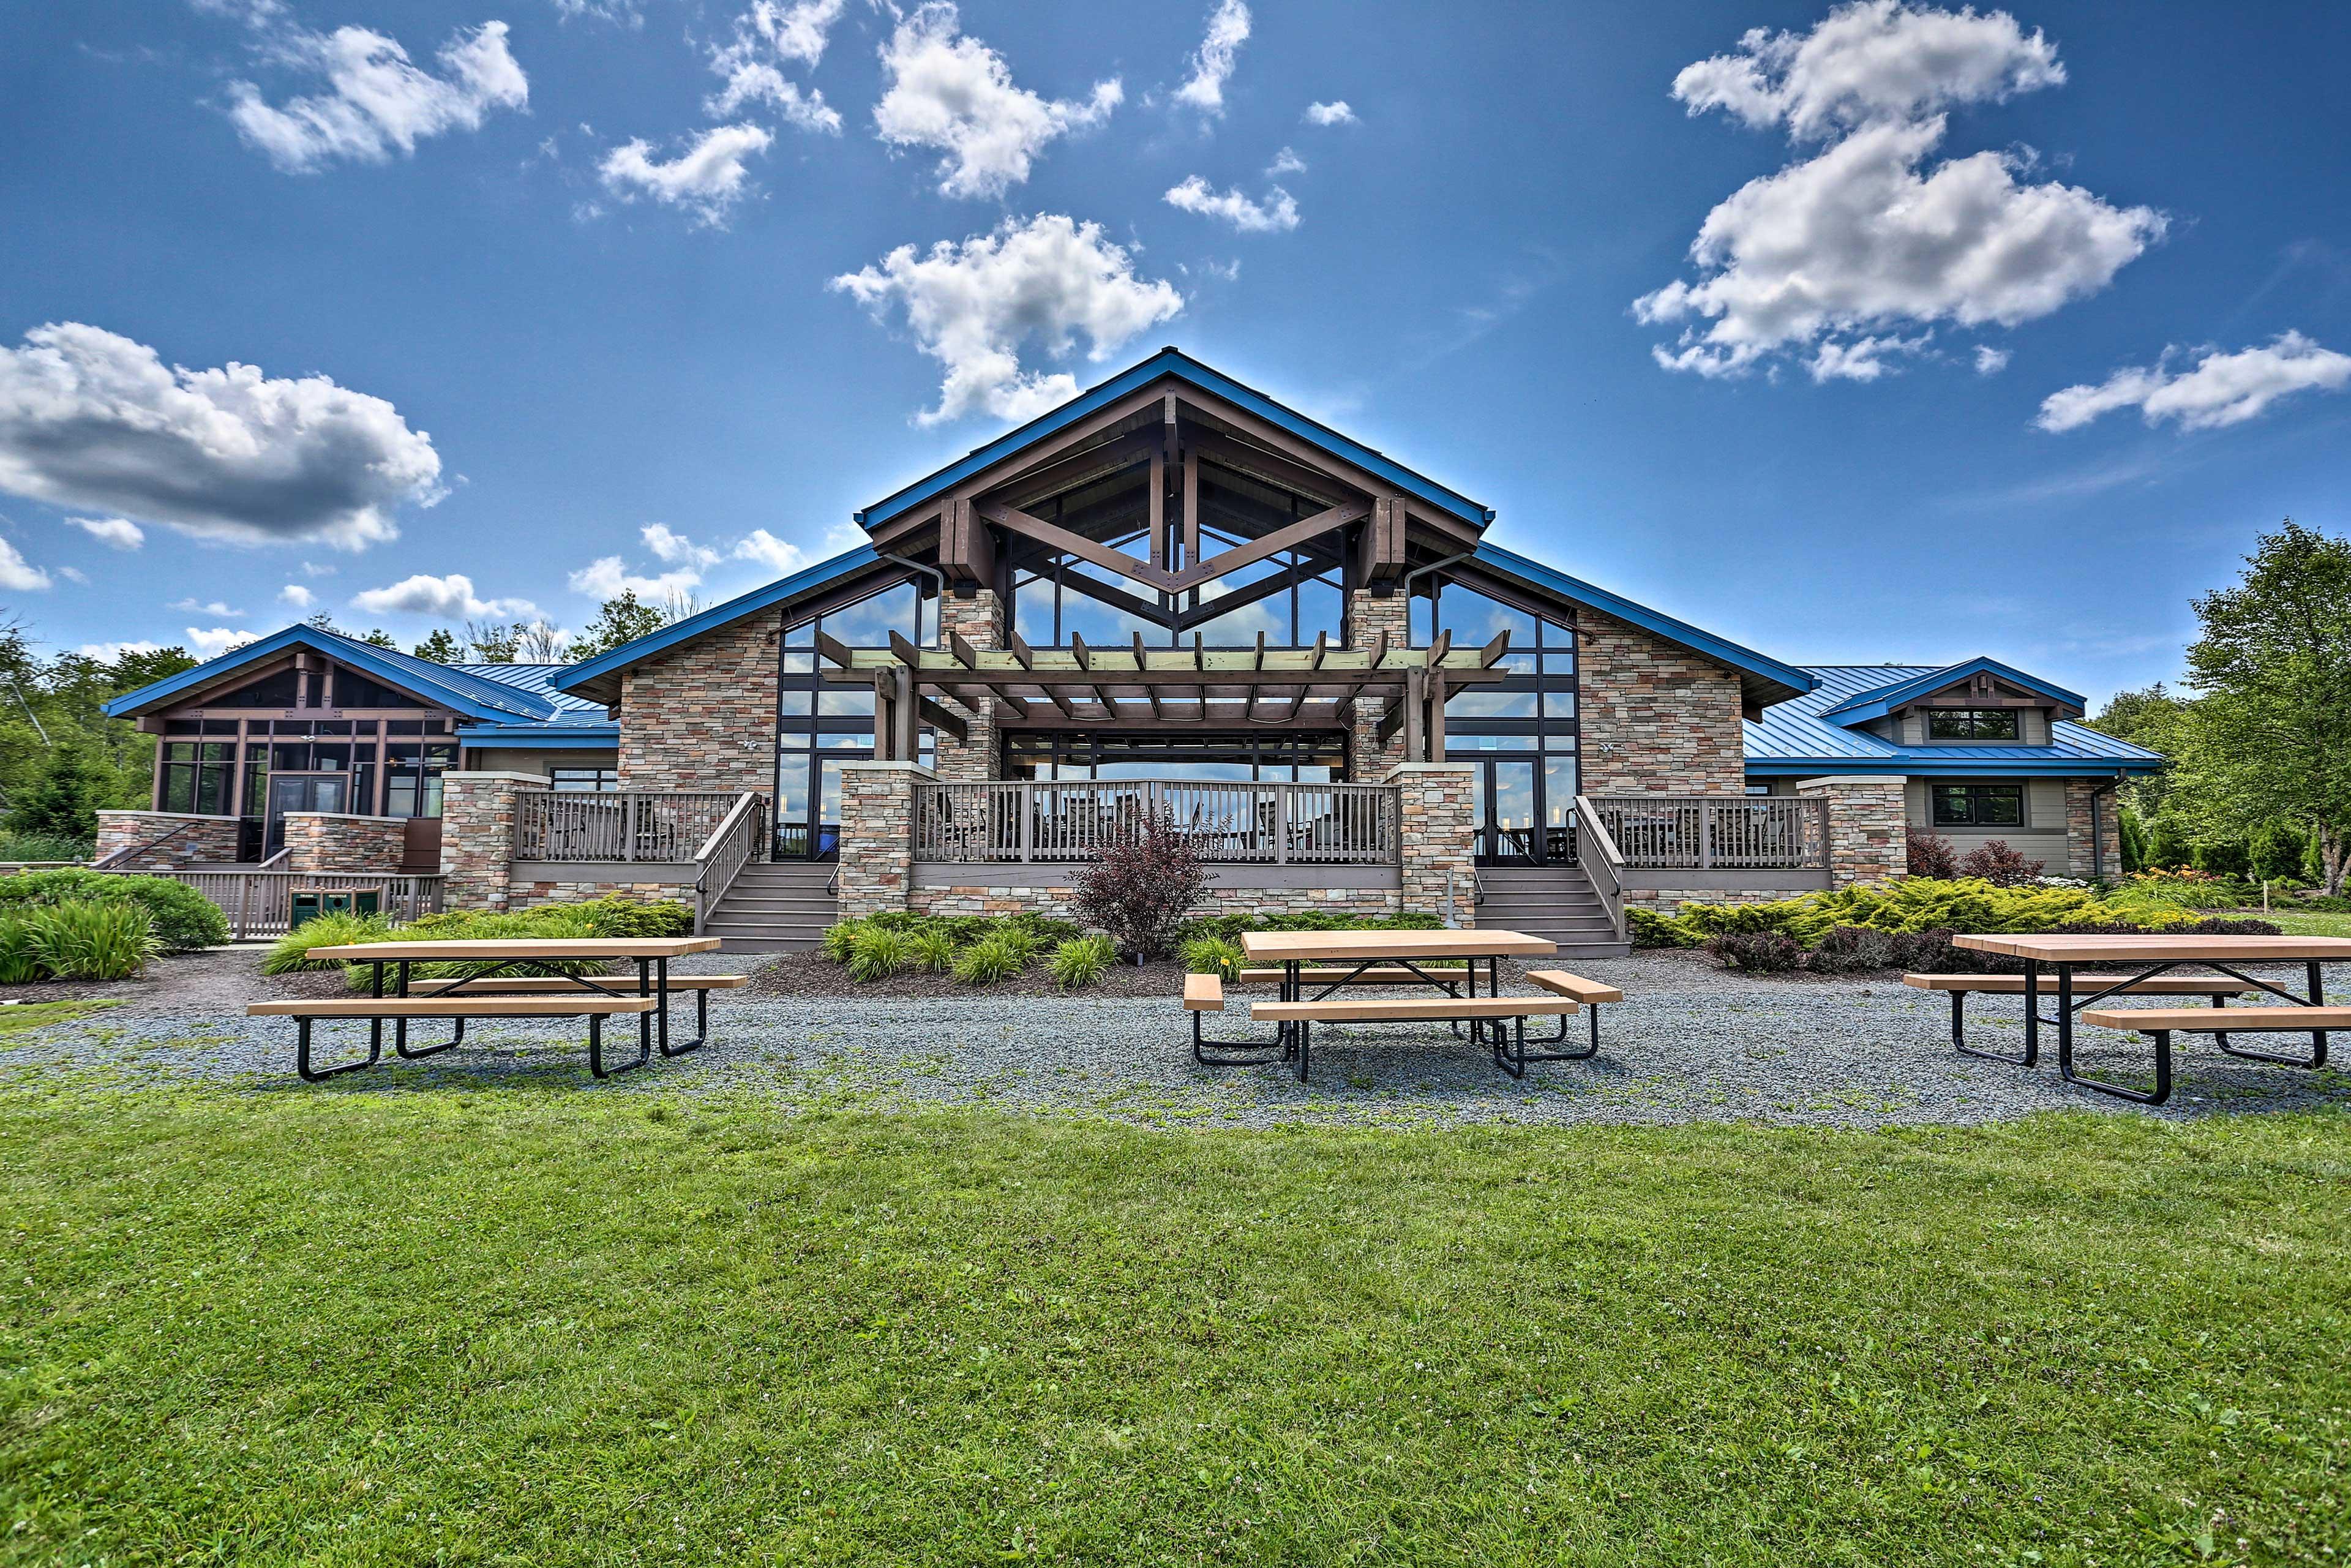 Lake Arrowhead Lake Community Amenities (additional on-site fee applies)